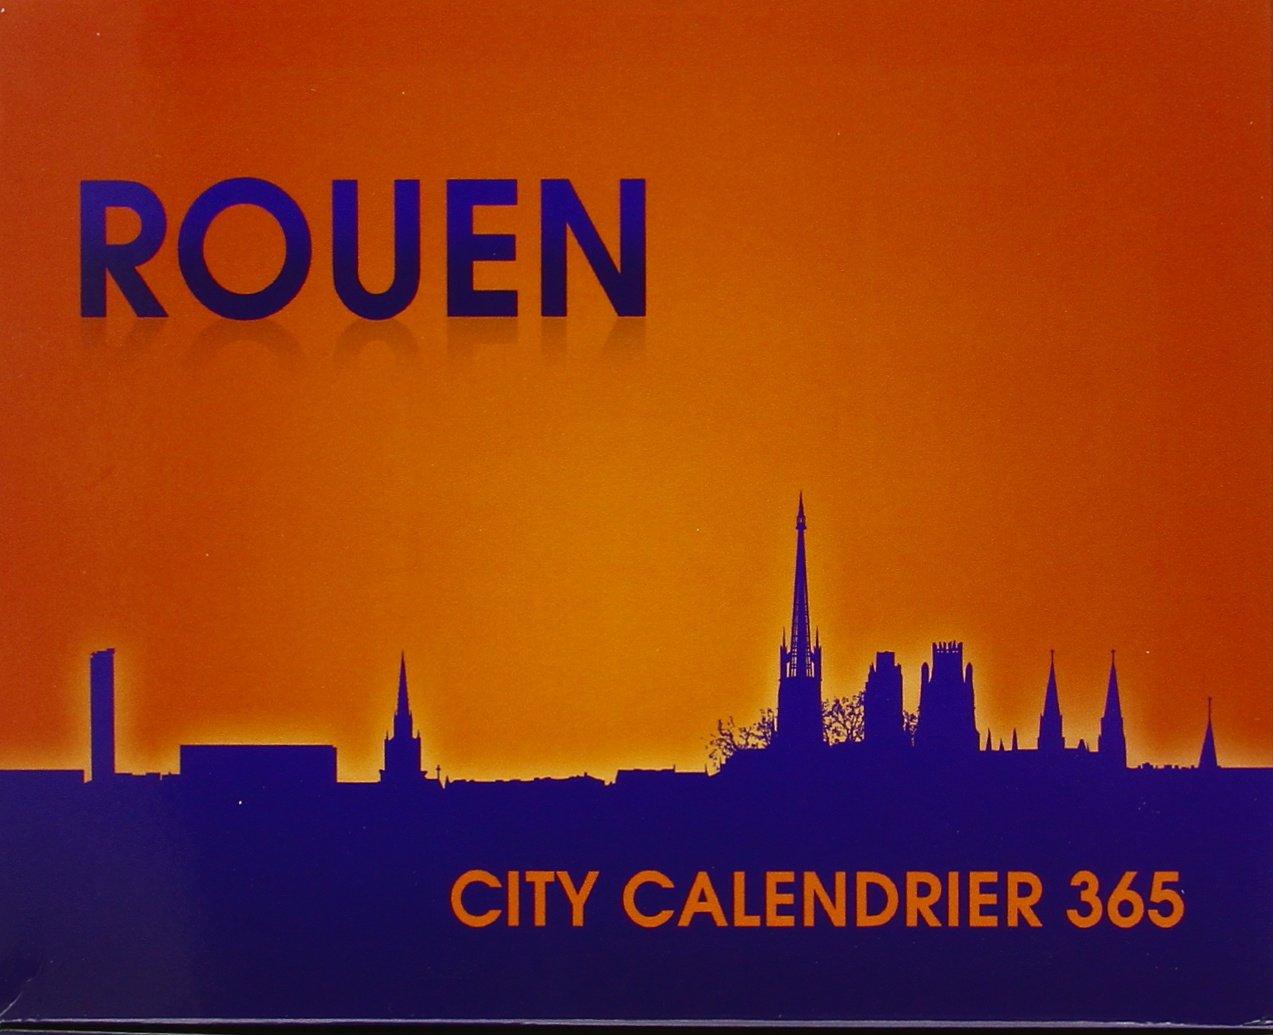 Calendrier City.City Calendrier Rouen 9782953535310 Amazon Com Books